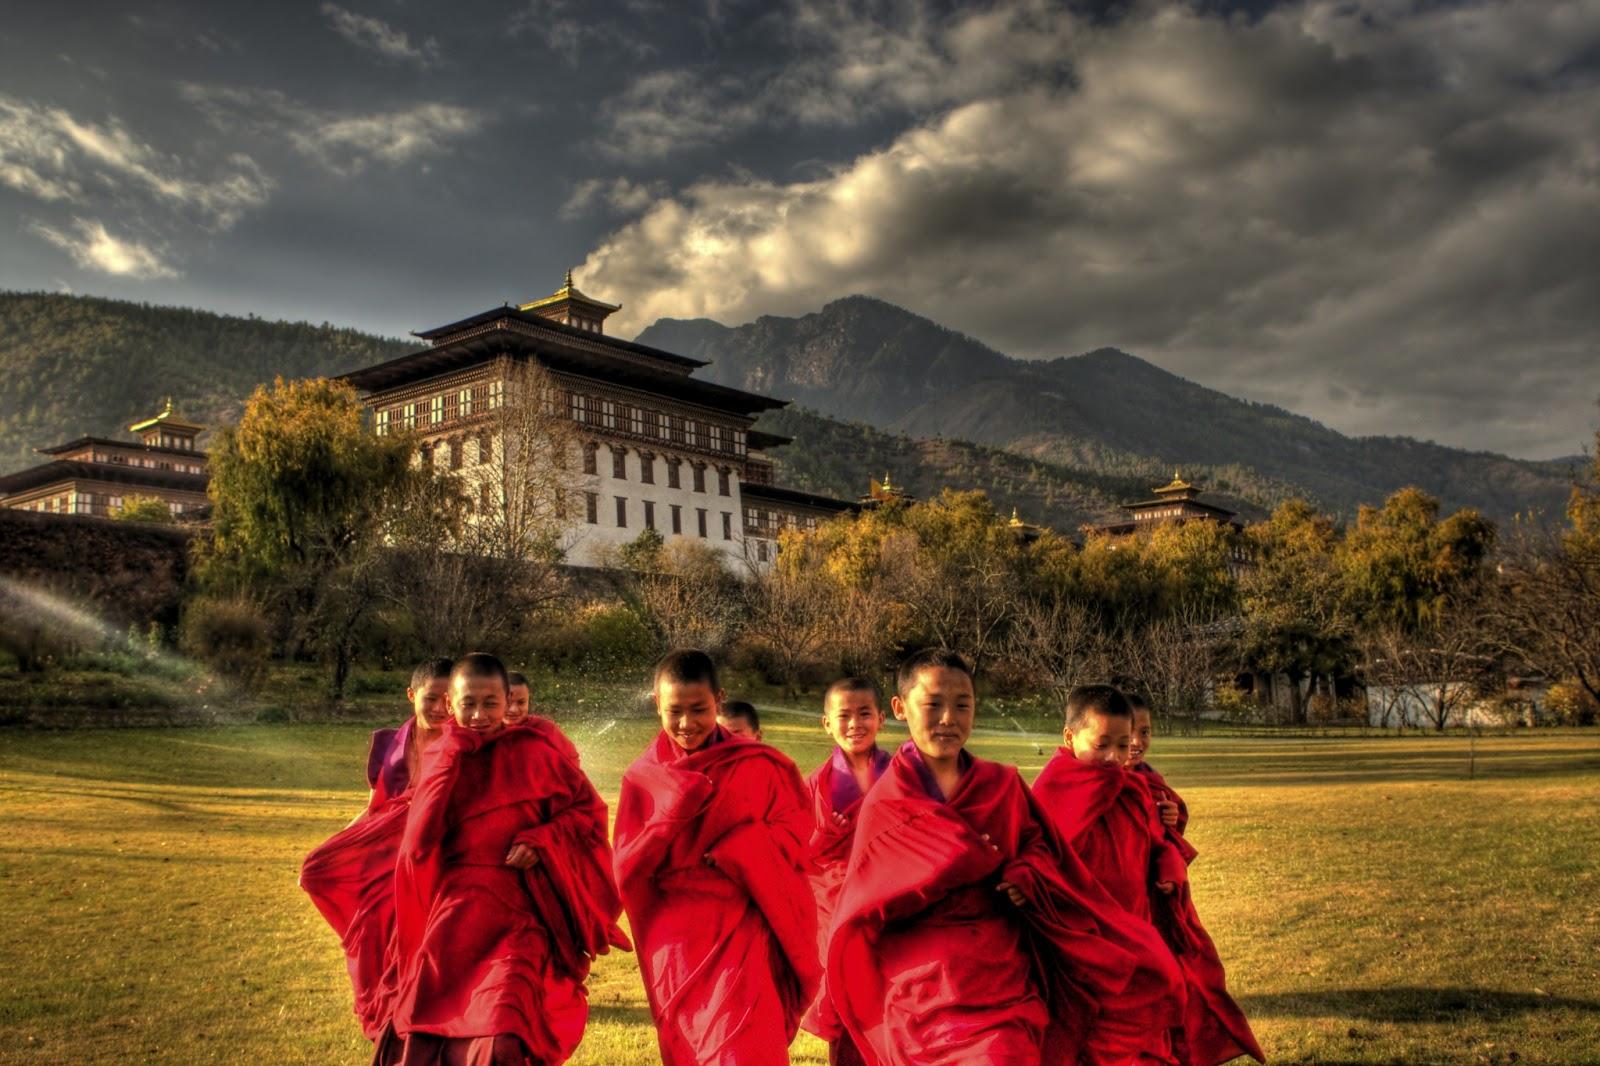 Buddha,Buddhism